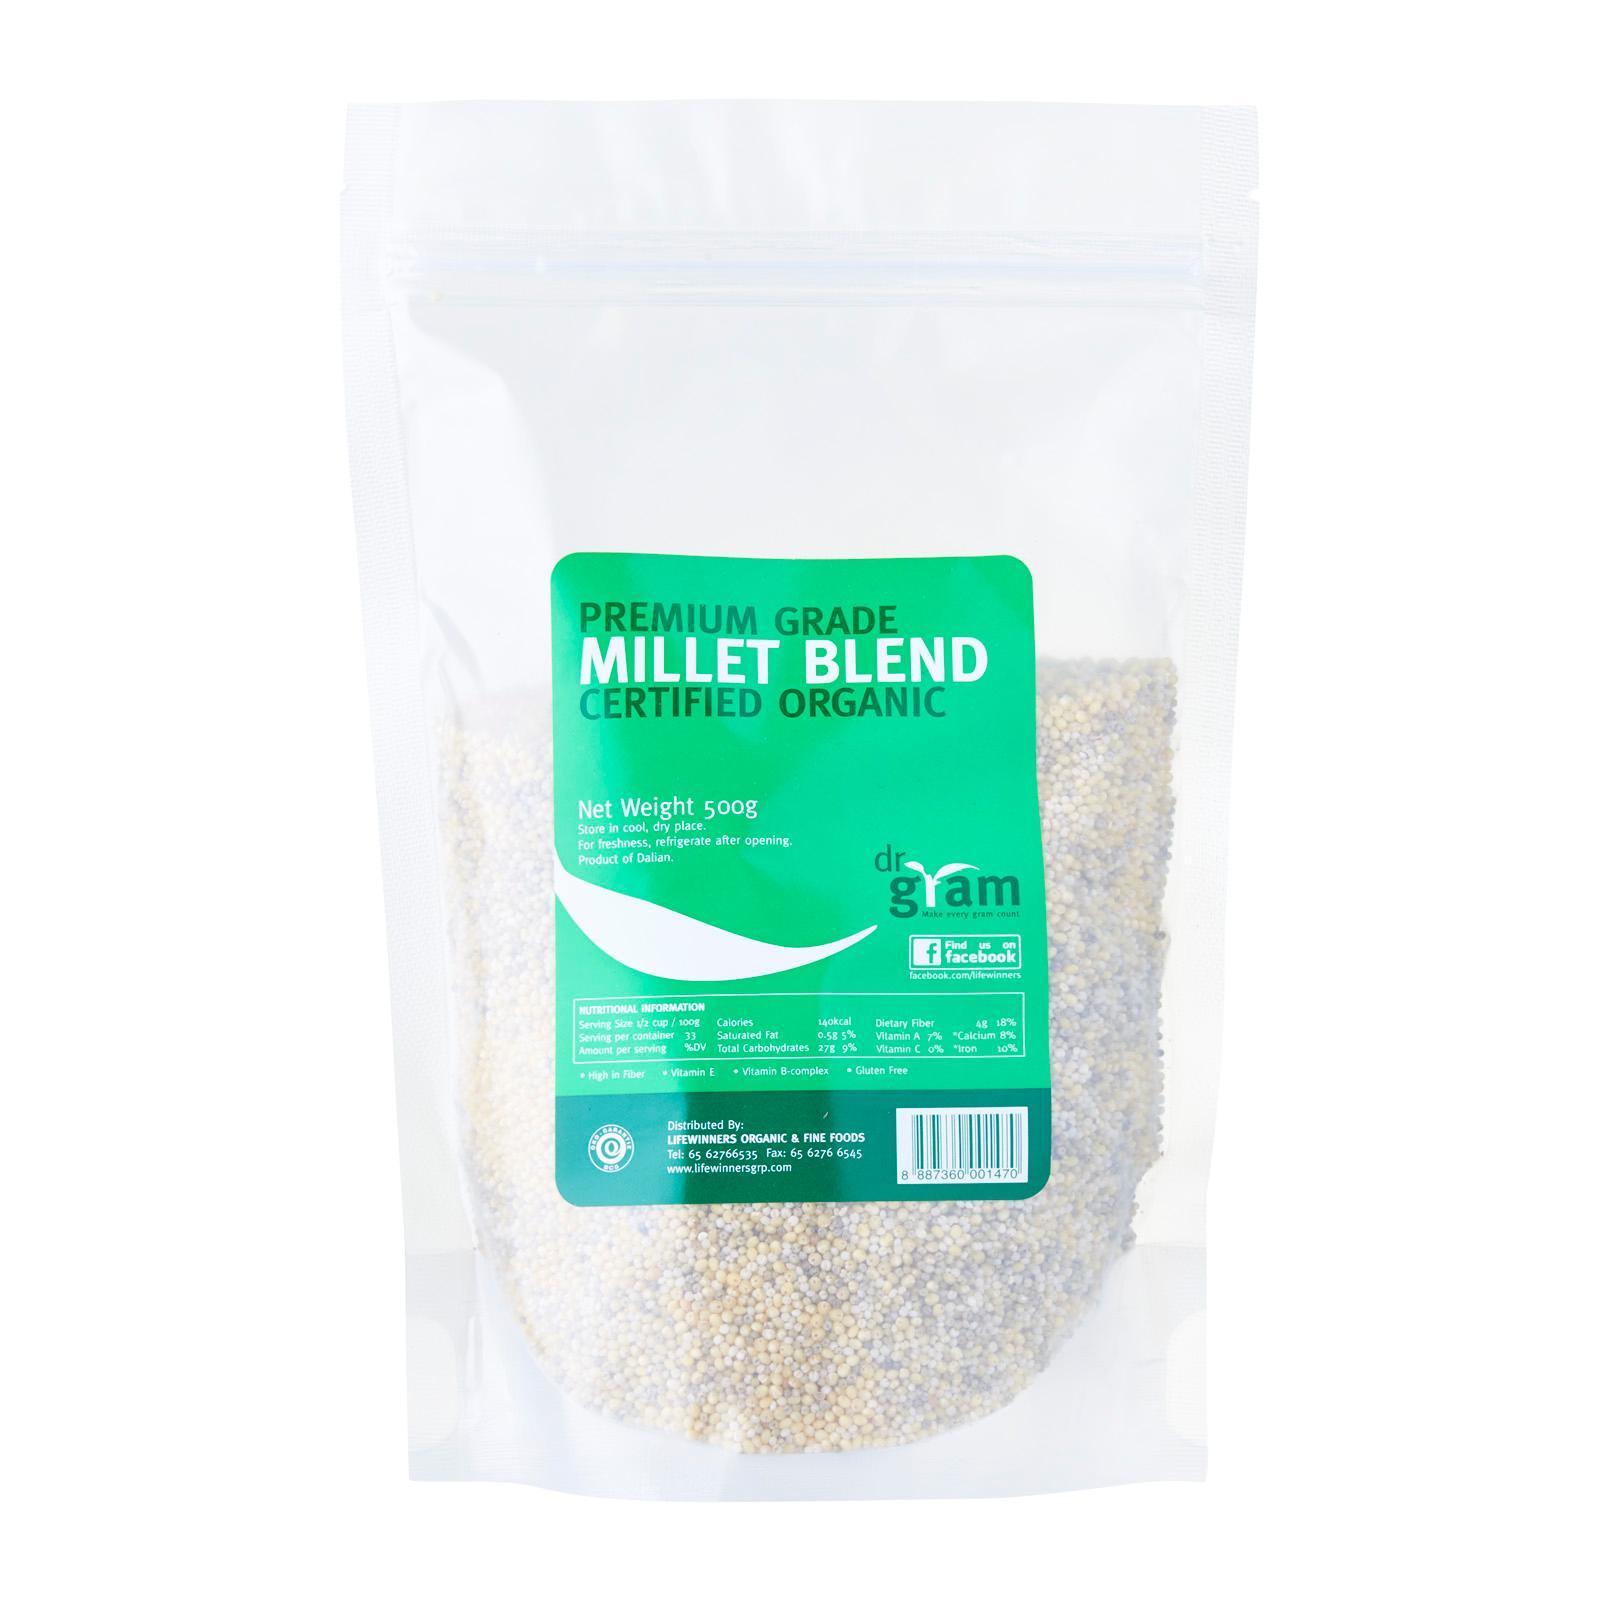 Dr Gram Organic Millet Blend (4 Packets) By Lifewinners Organic & Fine Foods.